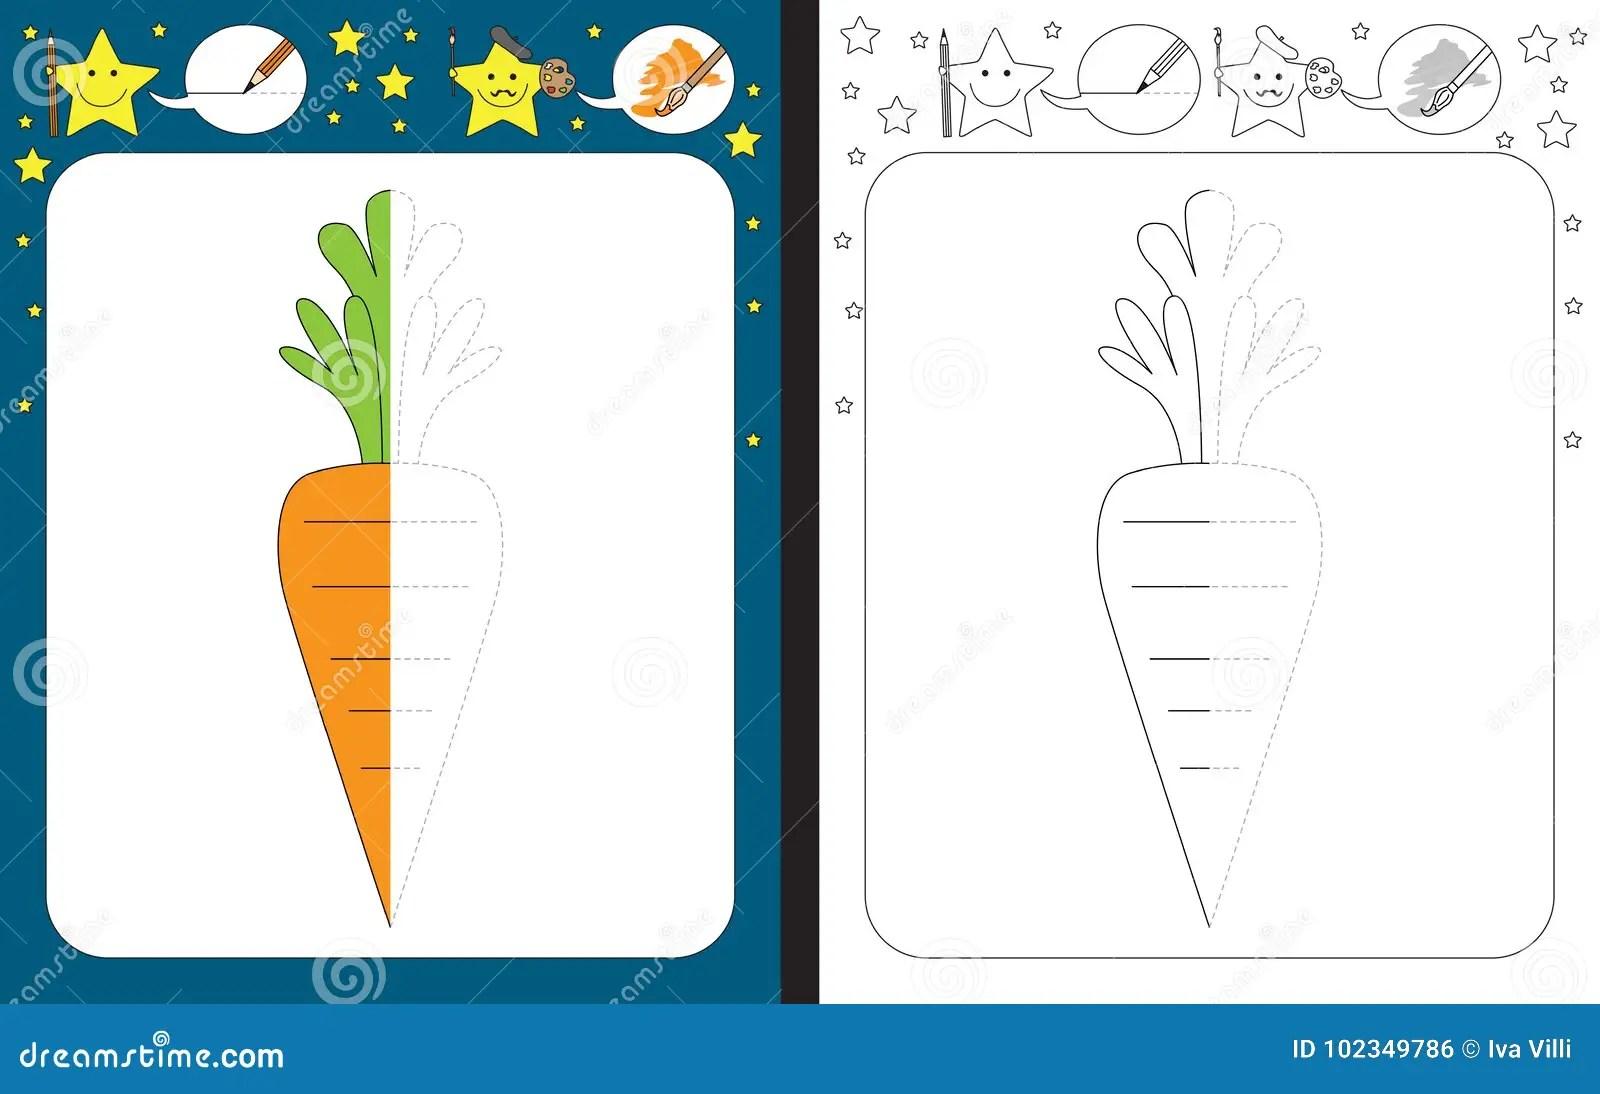 Preschool Worksheet Stock Vector Illustration Of Vector